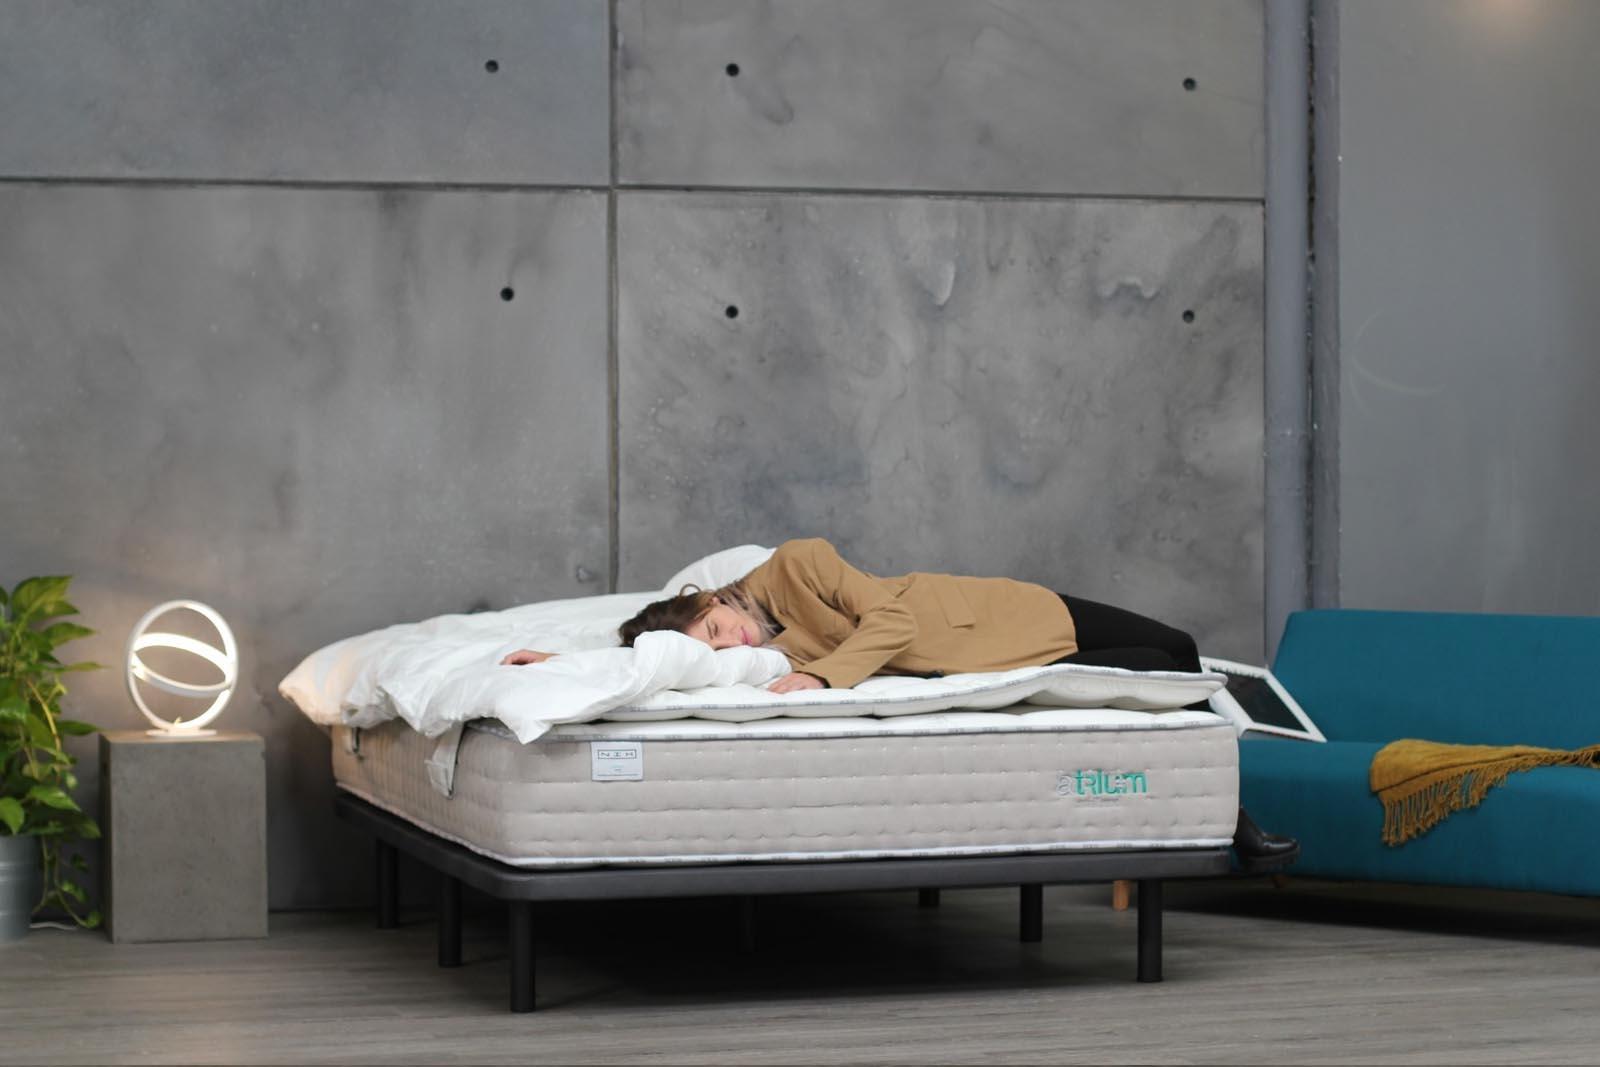 Base para colchón NIX Base con colchón NIX Tanit en habitación